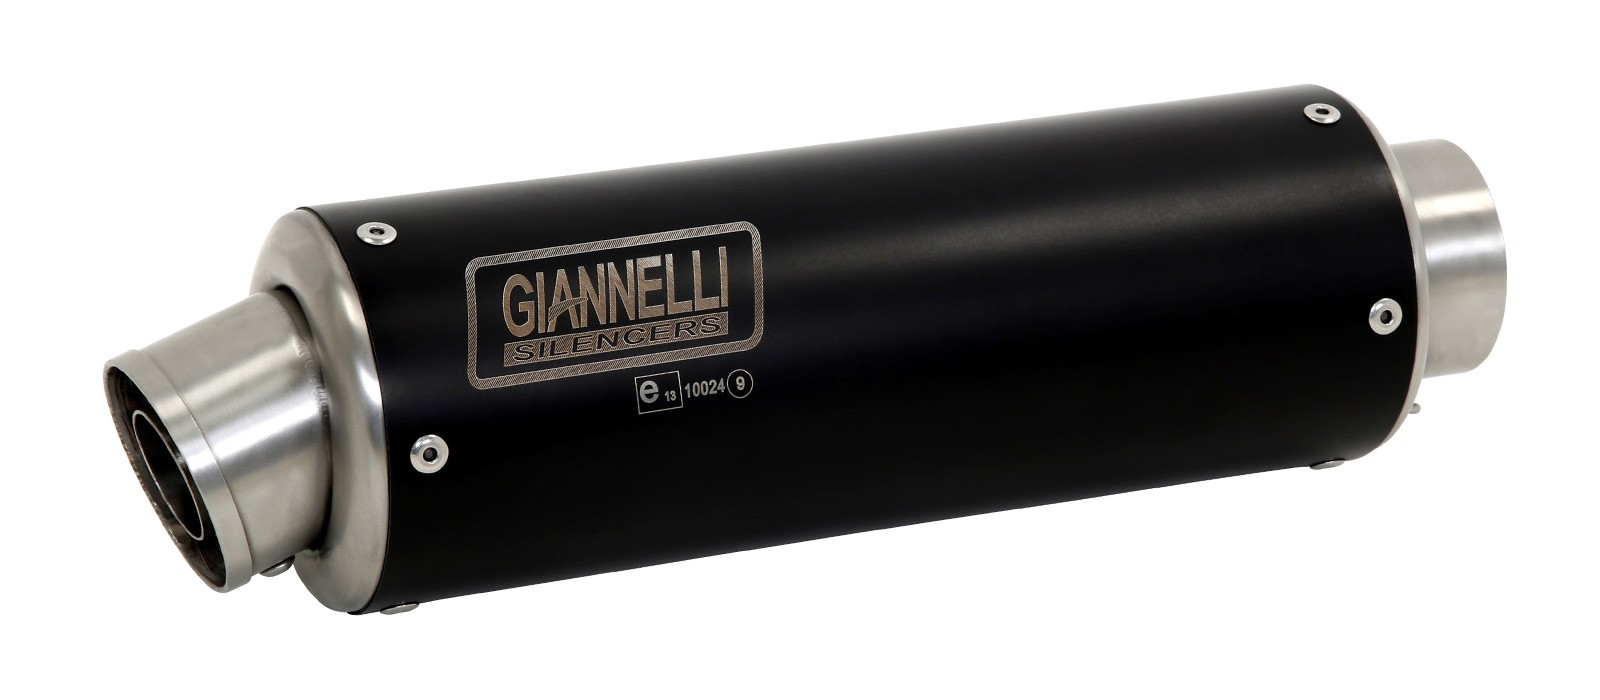 ESCAPES GIANNELLI YAMAHA - Sistema completo nicrom X-PRO Yamaha TRACER 700 Giannelli 73527XPI -